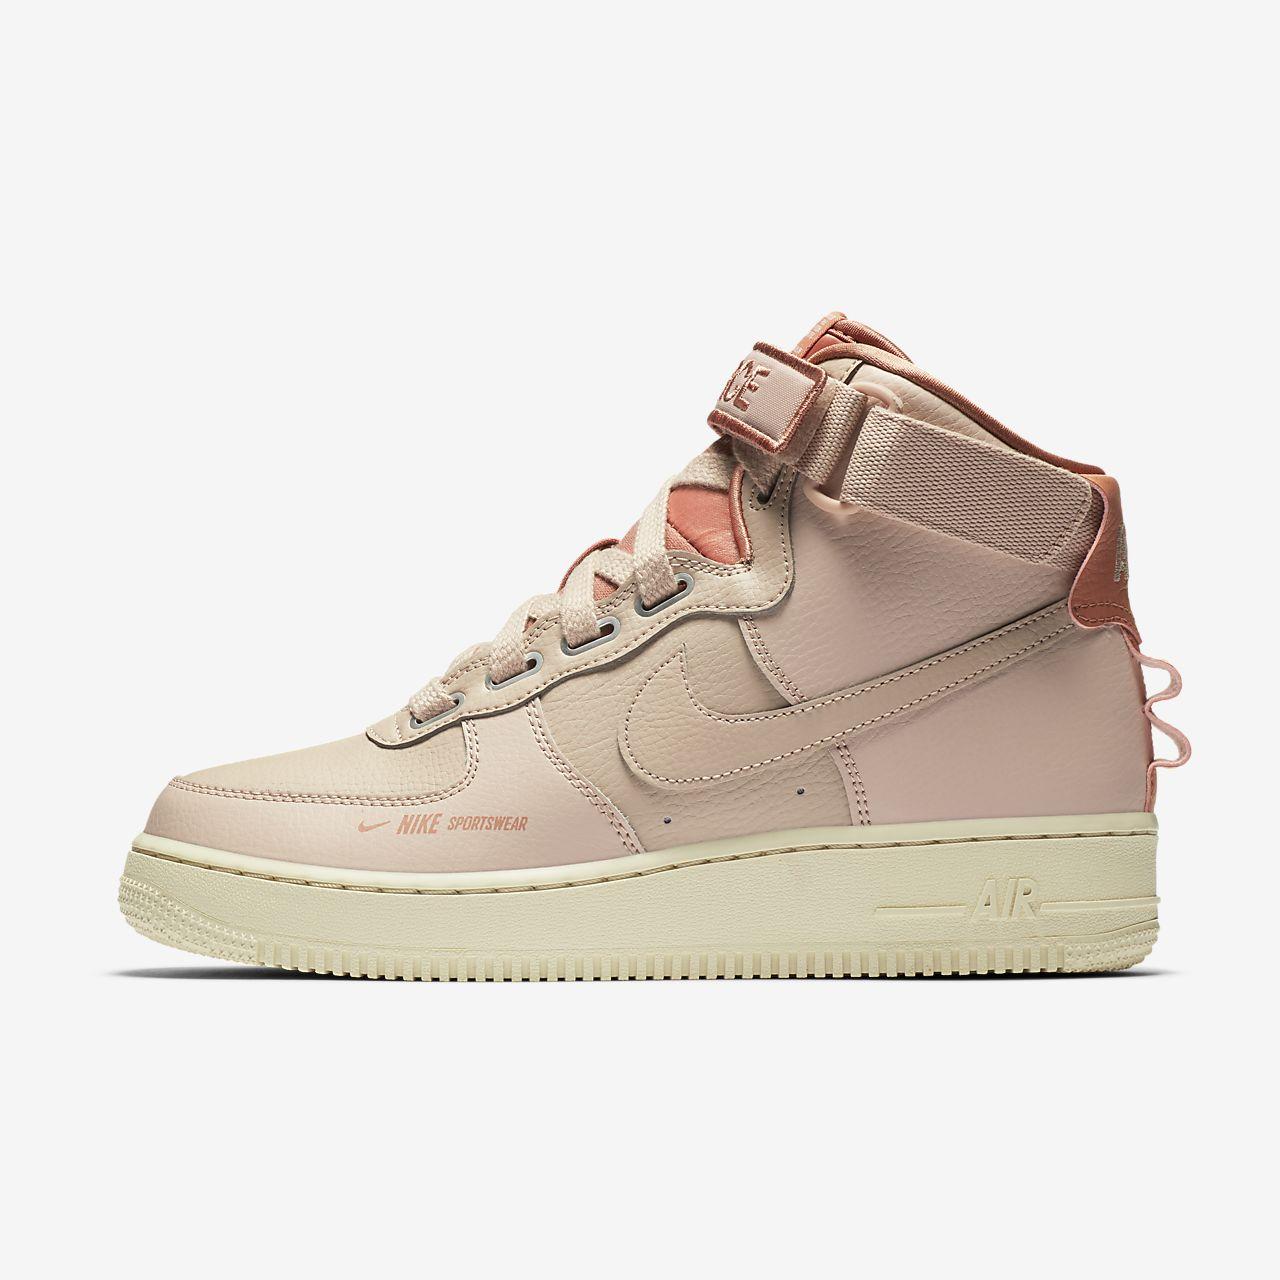 a3e5f66adee4 Nike Air Force 1 High Utility Kadın Ayakkabısı. Nike.com TR